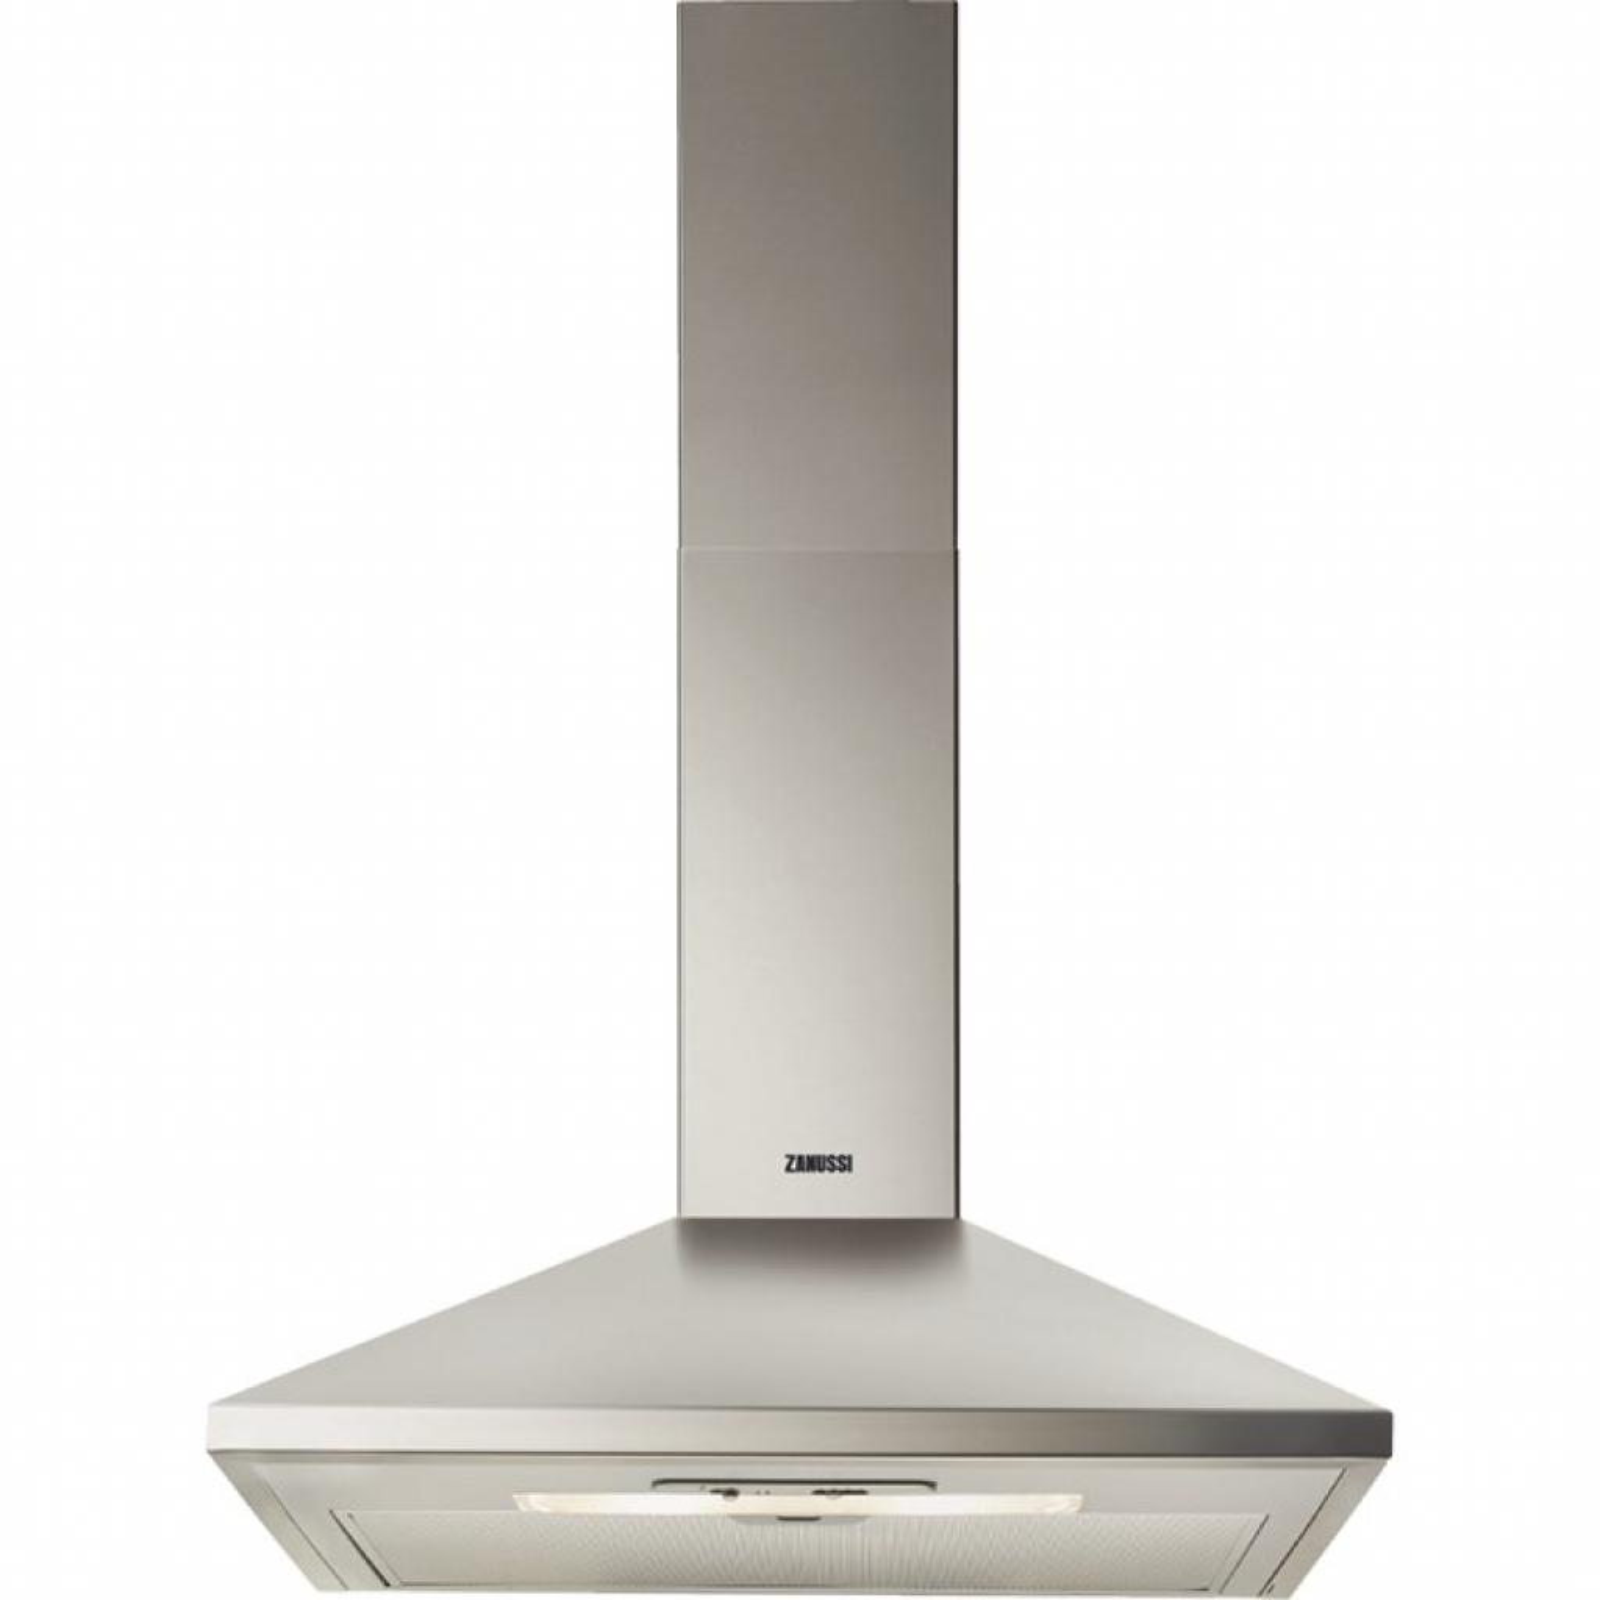 Вытяжка кухонная Zanussi ZHC 6131 X (ZHC6131X)